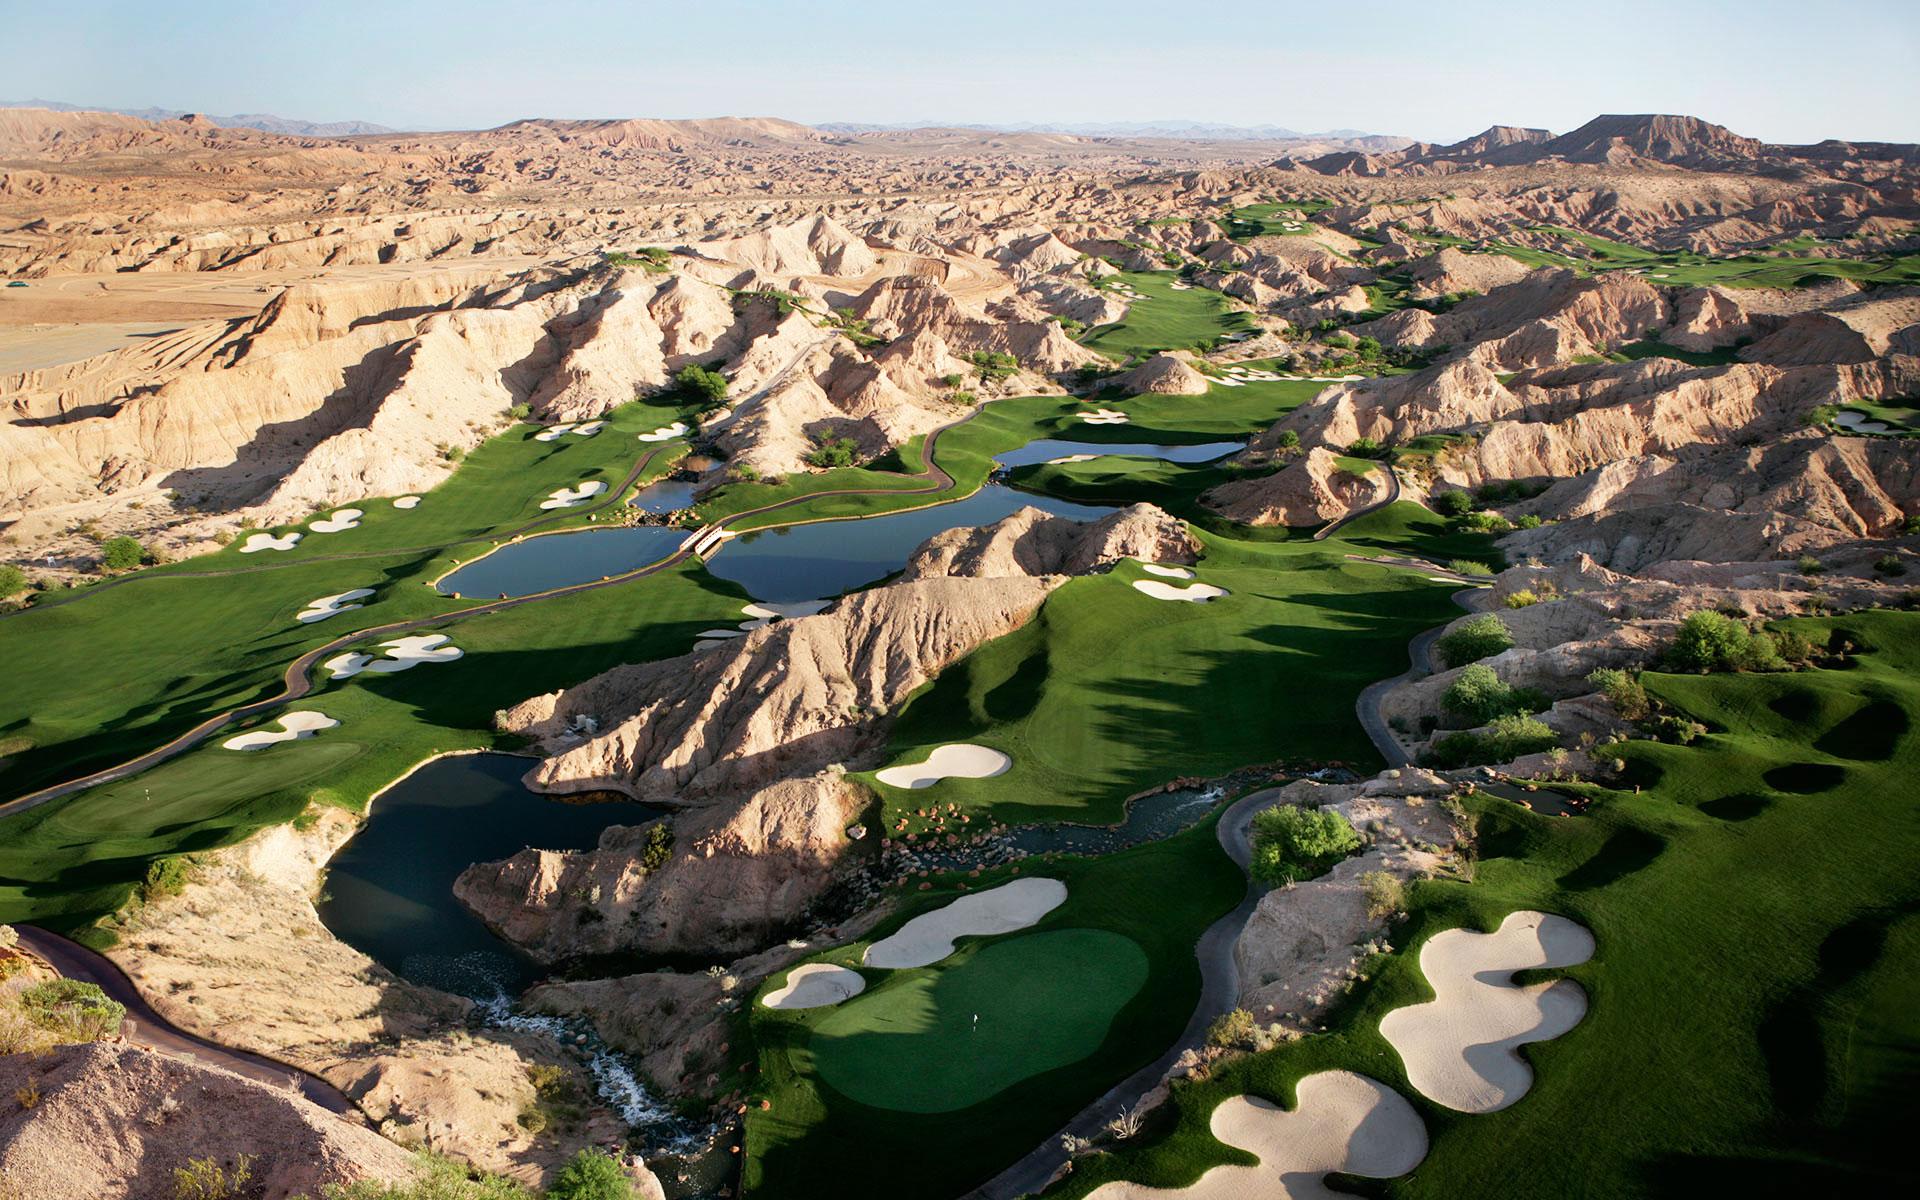 Wondrous Las Vegas Nevada Mesquite Courses Wolf Creek Golf Resort Home Interior And Landscaping Oversignezvosmurscom